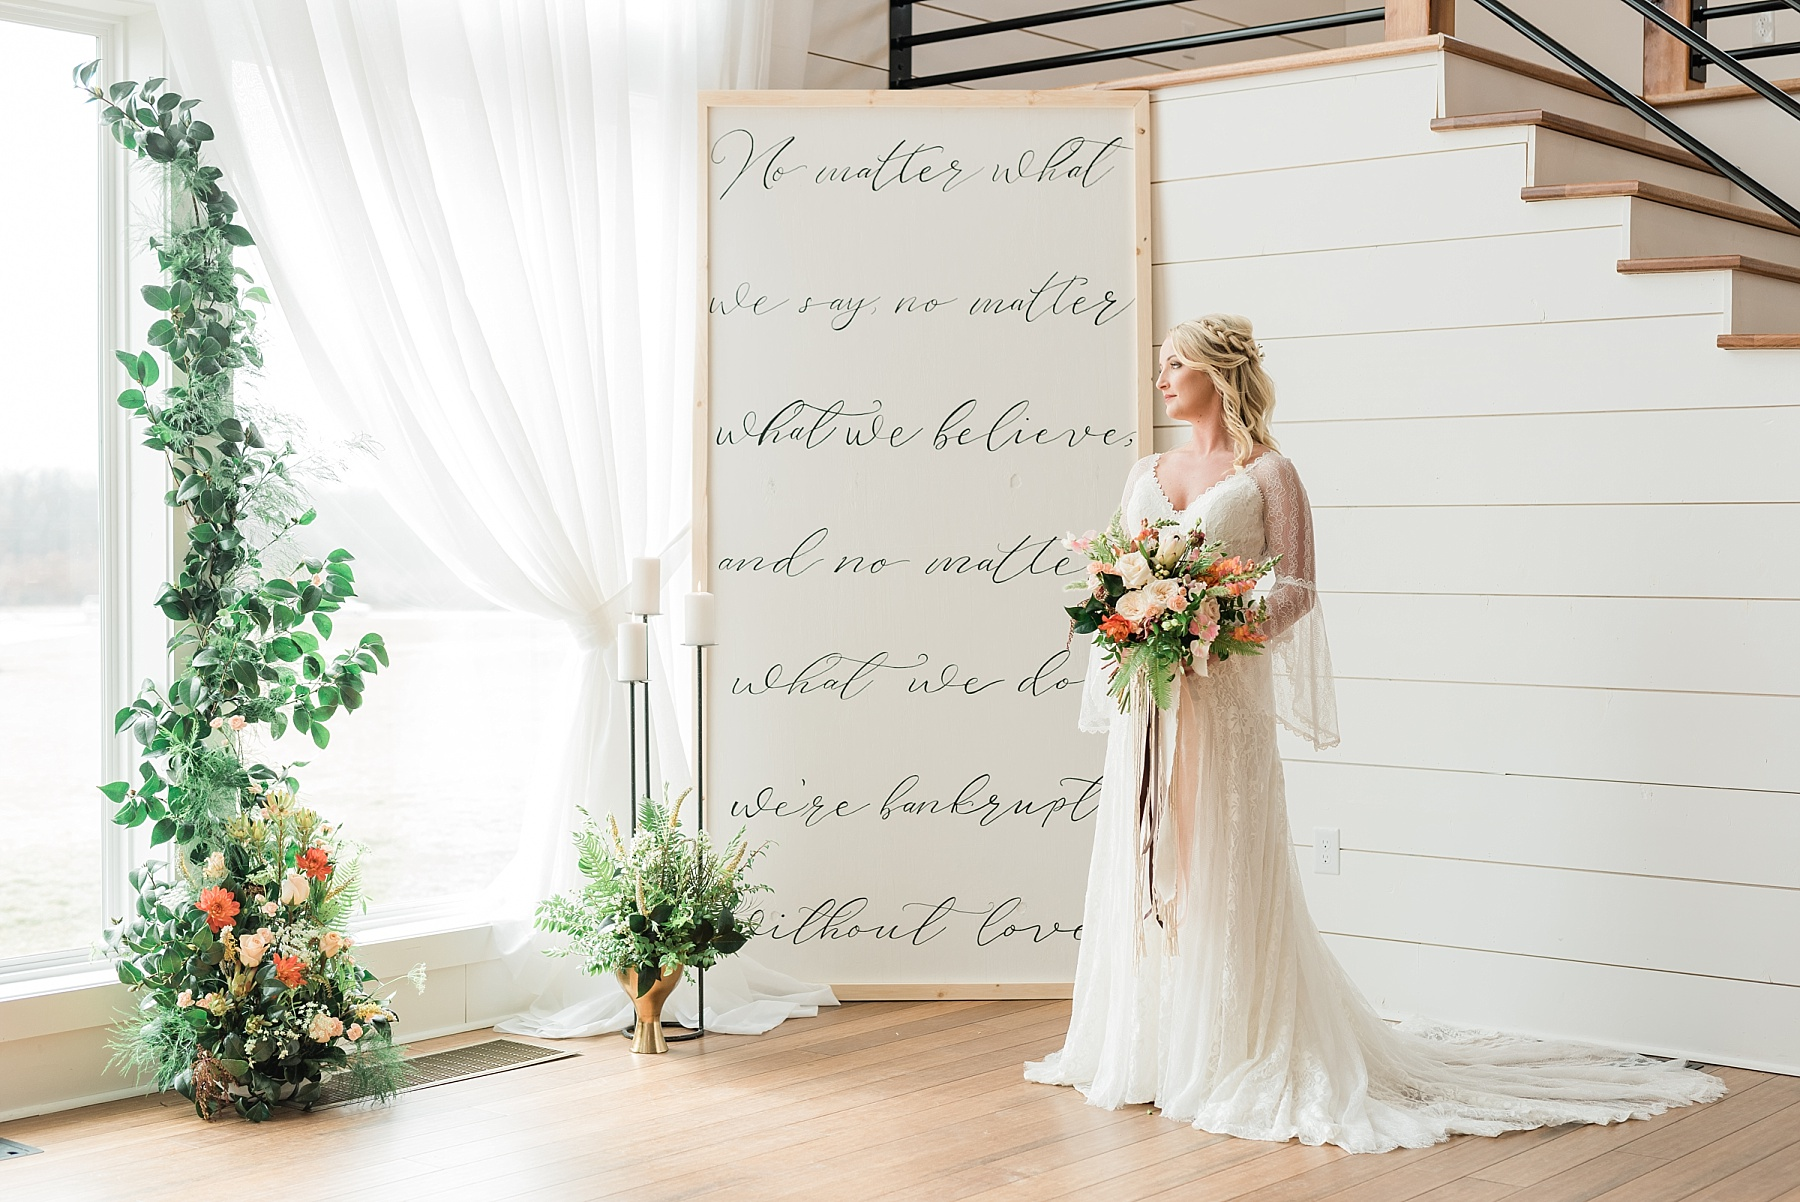 Eclectic Scandinavian Winter Wedding in All White Venue Emerson Fields by Kelsi Kliethermes Photography Best Missouri and Maui Wedding Photographer_0026.jpg